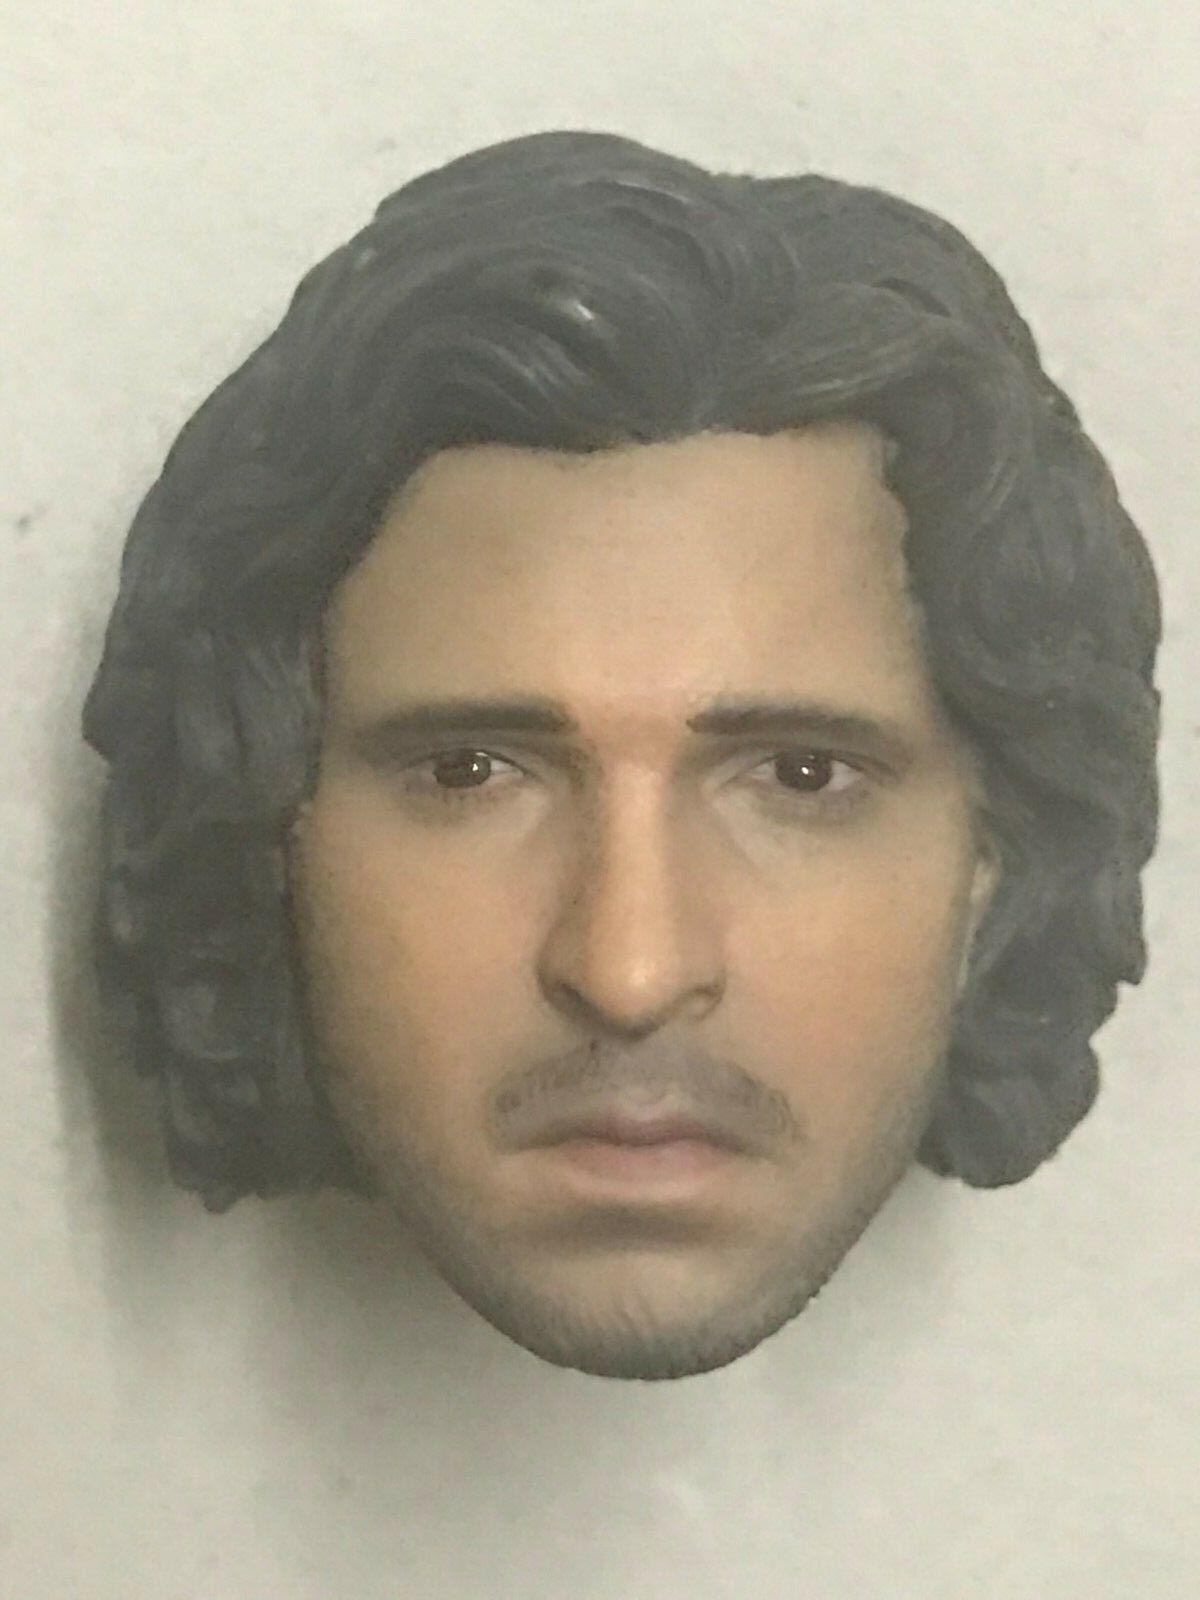 ThreeZero Game of Thrones Jon Snow - 1 6th  scale head sculpt  prix de gros